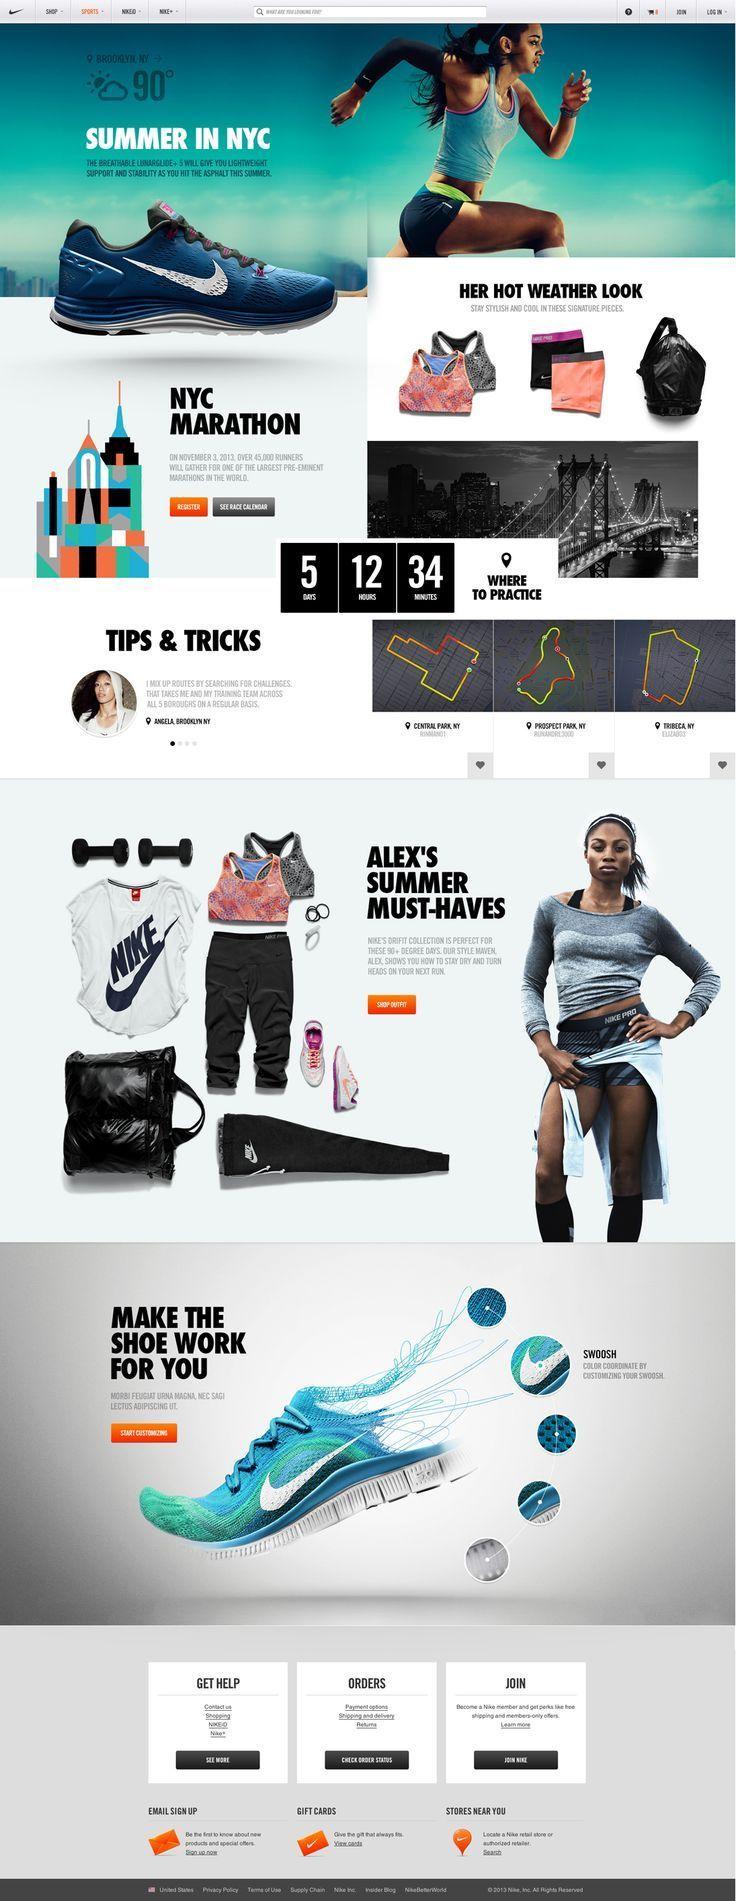 Product, Visual & UX Design